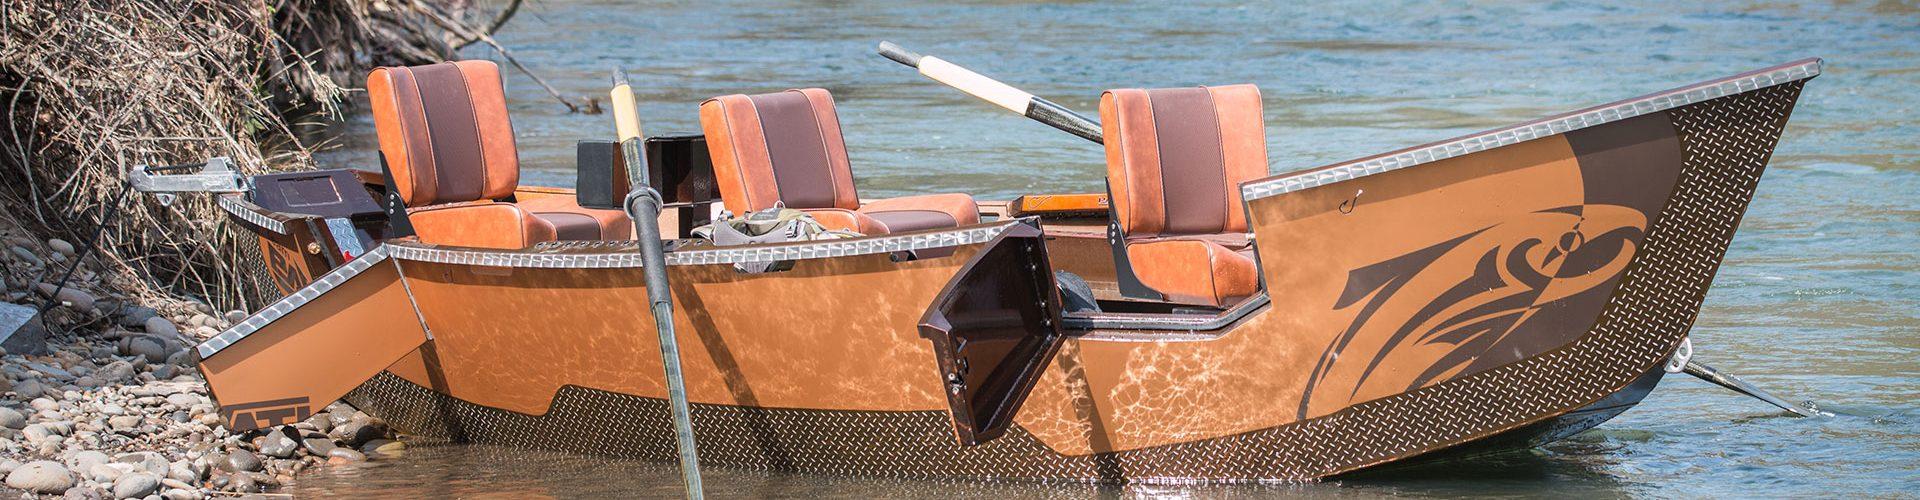 Pavati Marine Aluminum Drift Boats Drift Boat